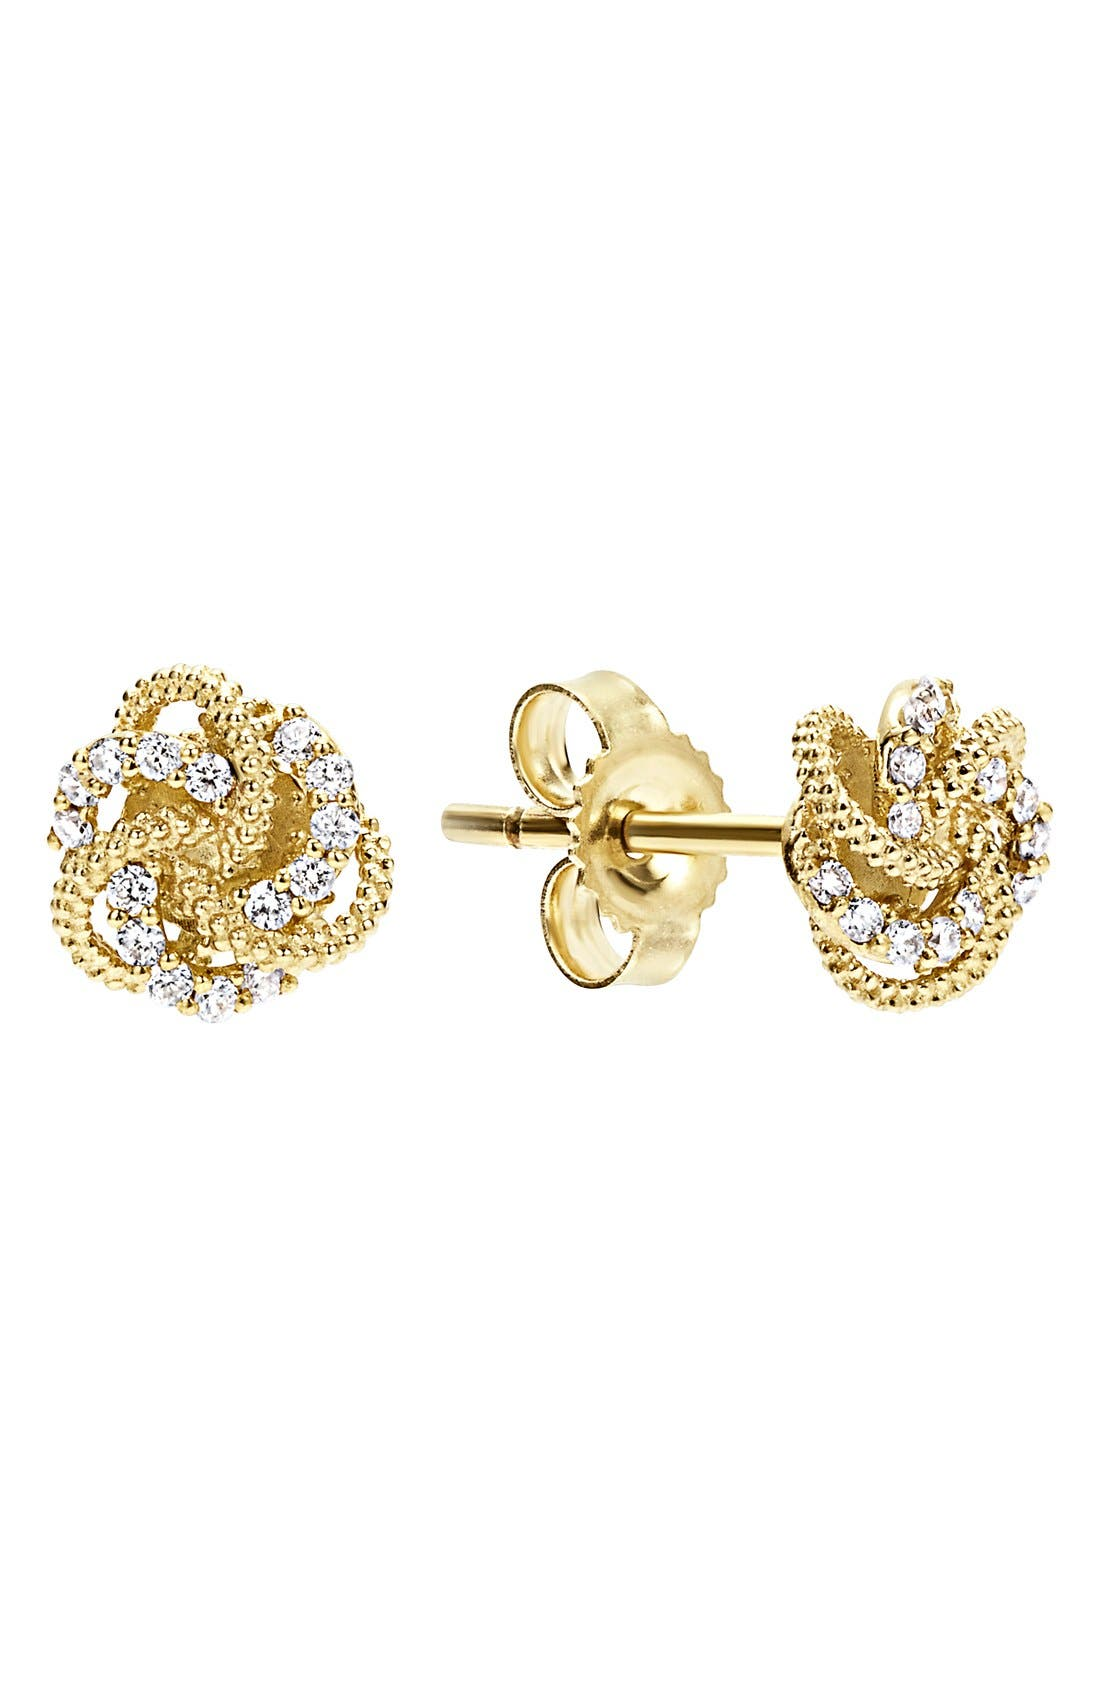 'Love Knot' Stud Earrings,                             Main thumbnail 1, color,                             GOLD